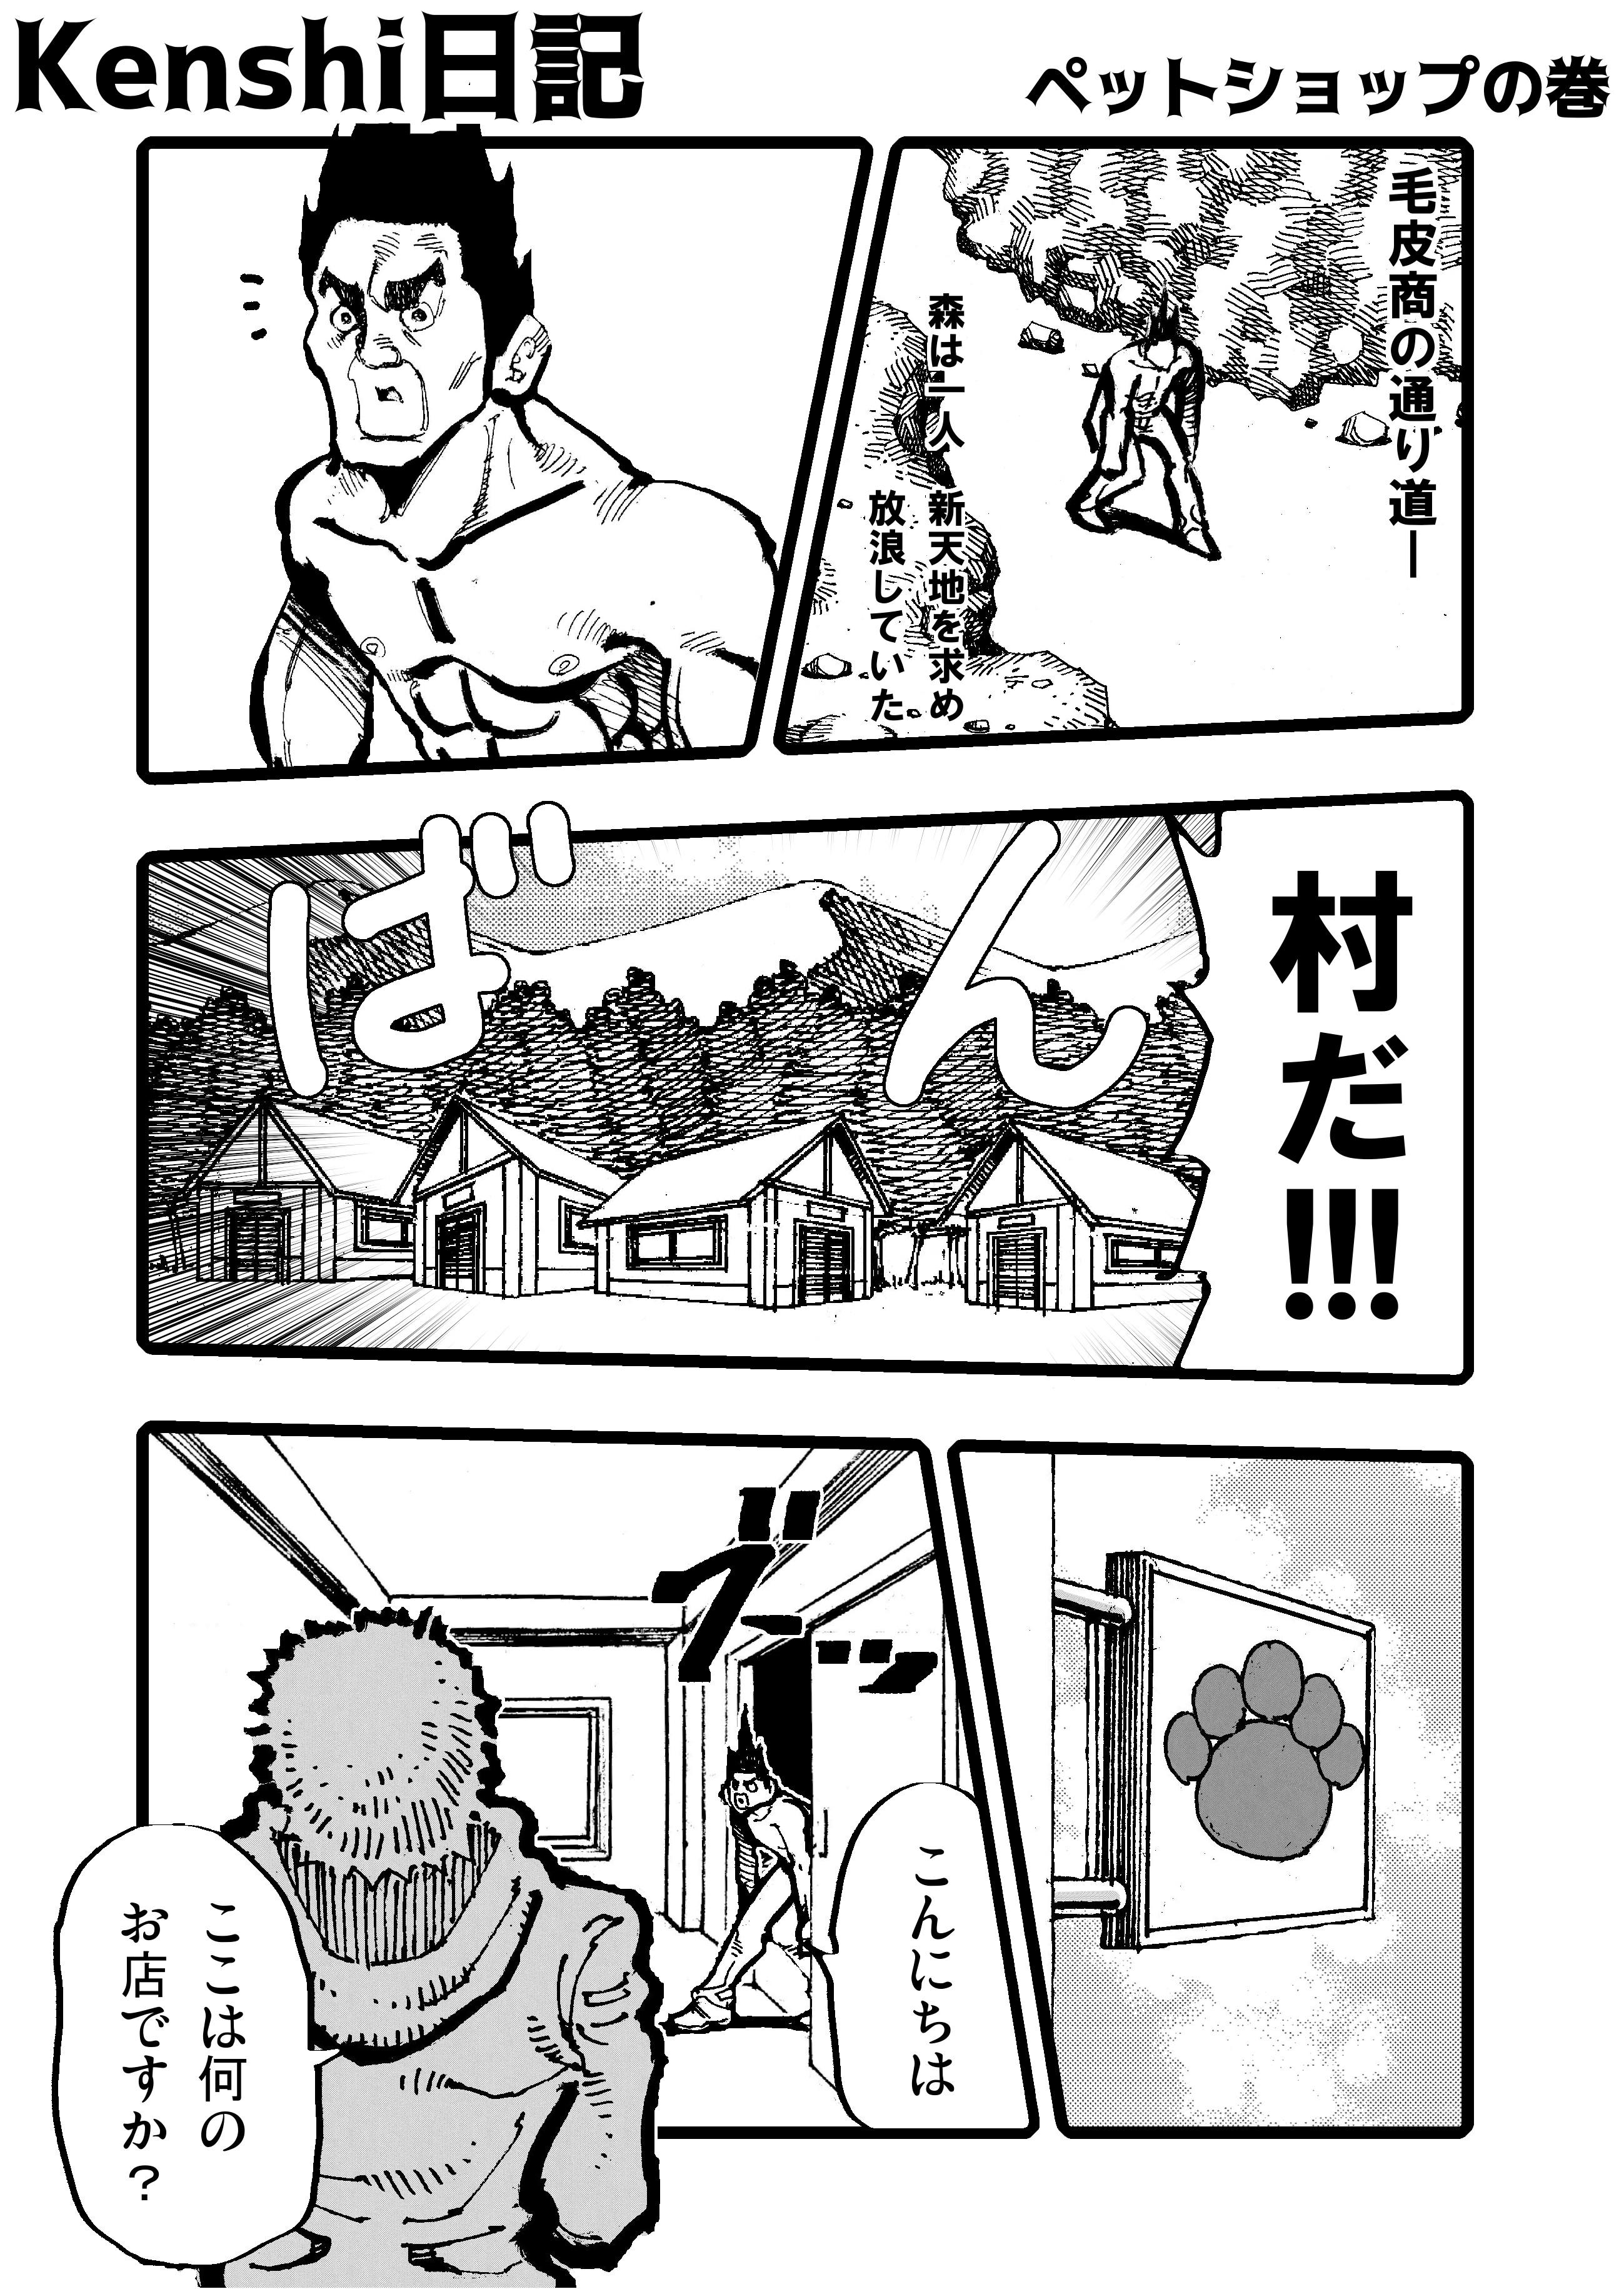 Kenshi日記21 ペットショップの巻